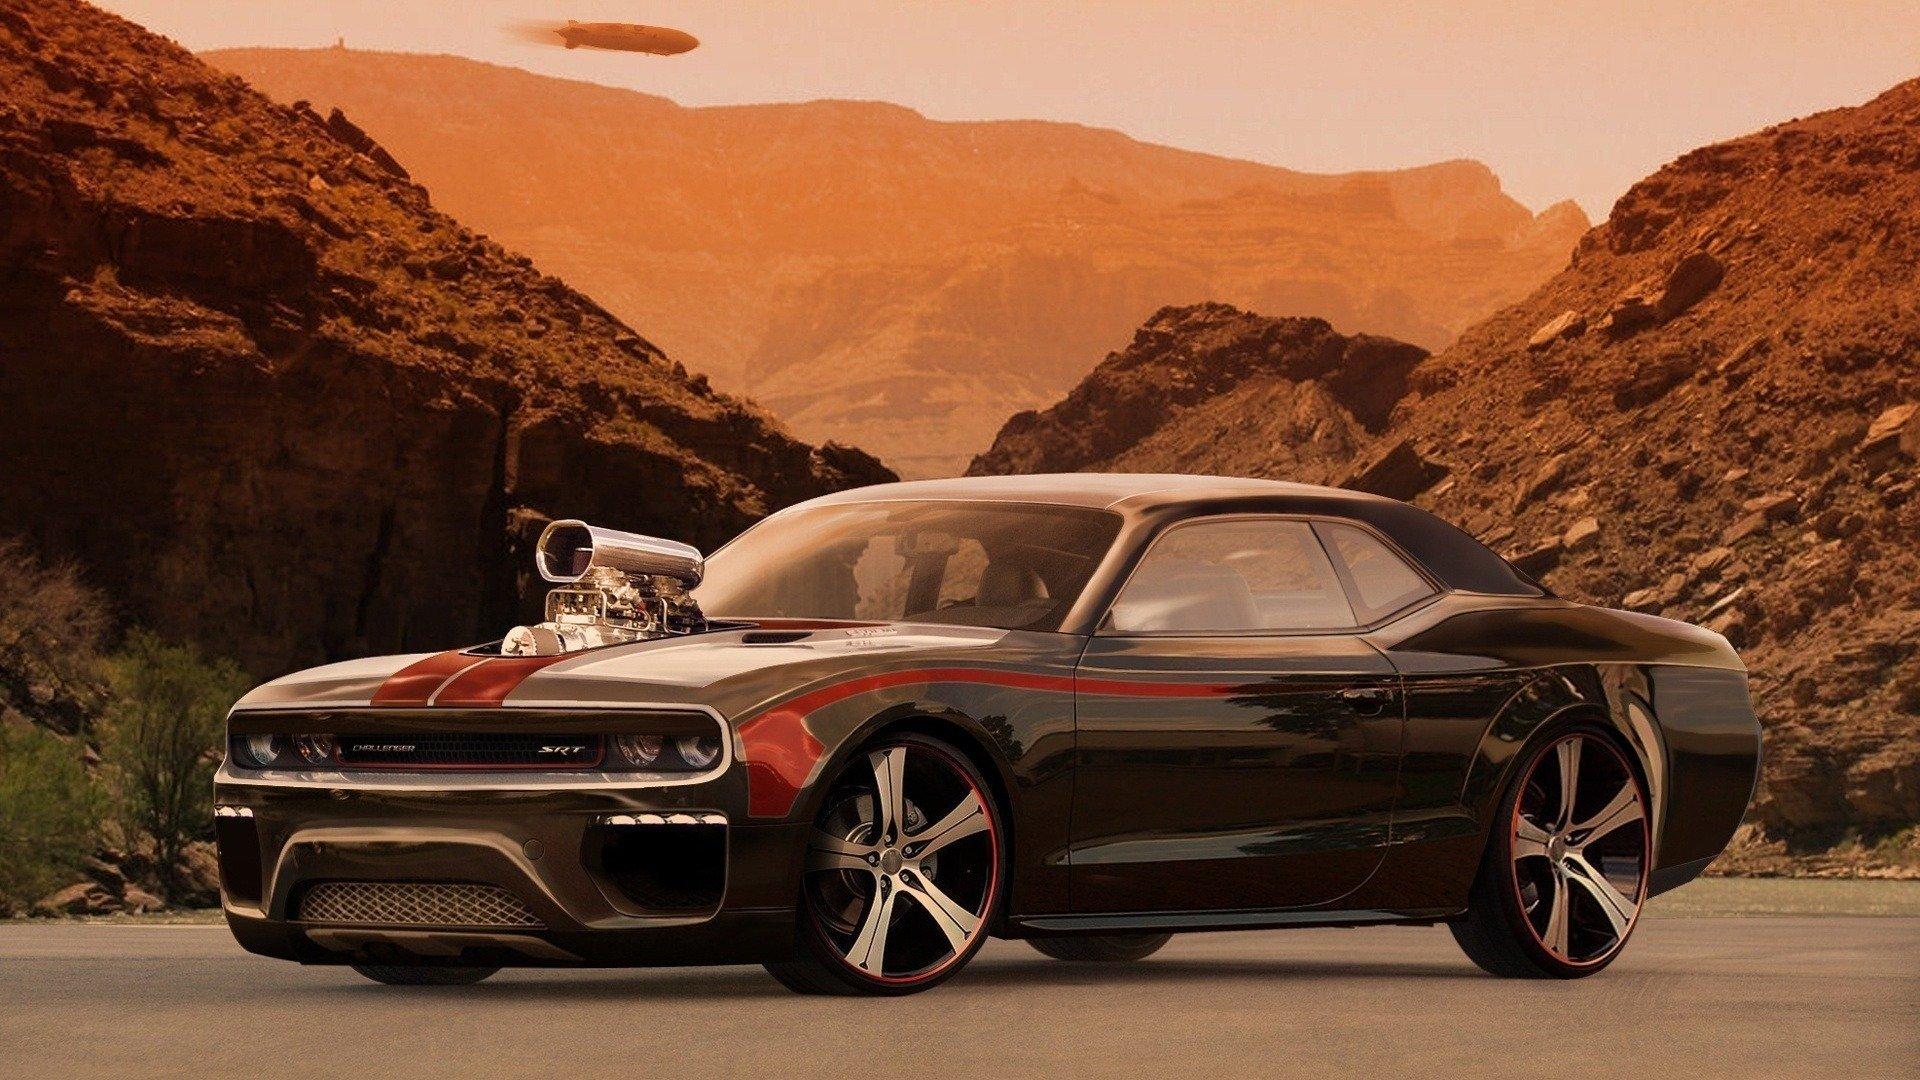 car, cool, wallpaper, desktop, wallpapers, speedy, muscle